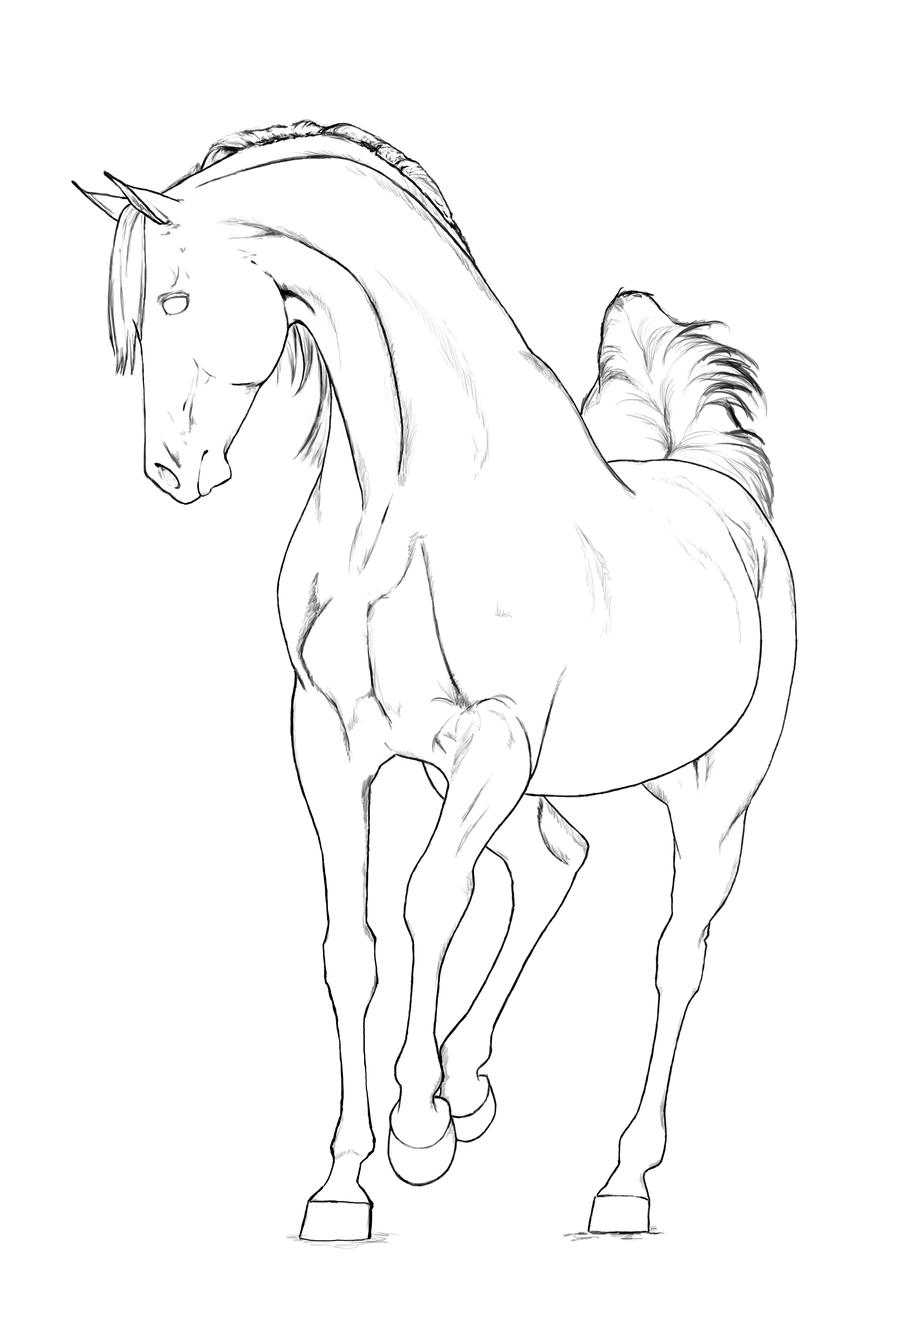 Arabian stallion lineart by akuinnen24 on DeviantArt